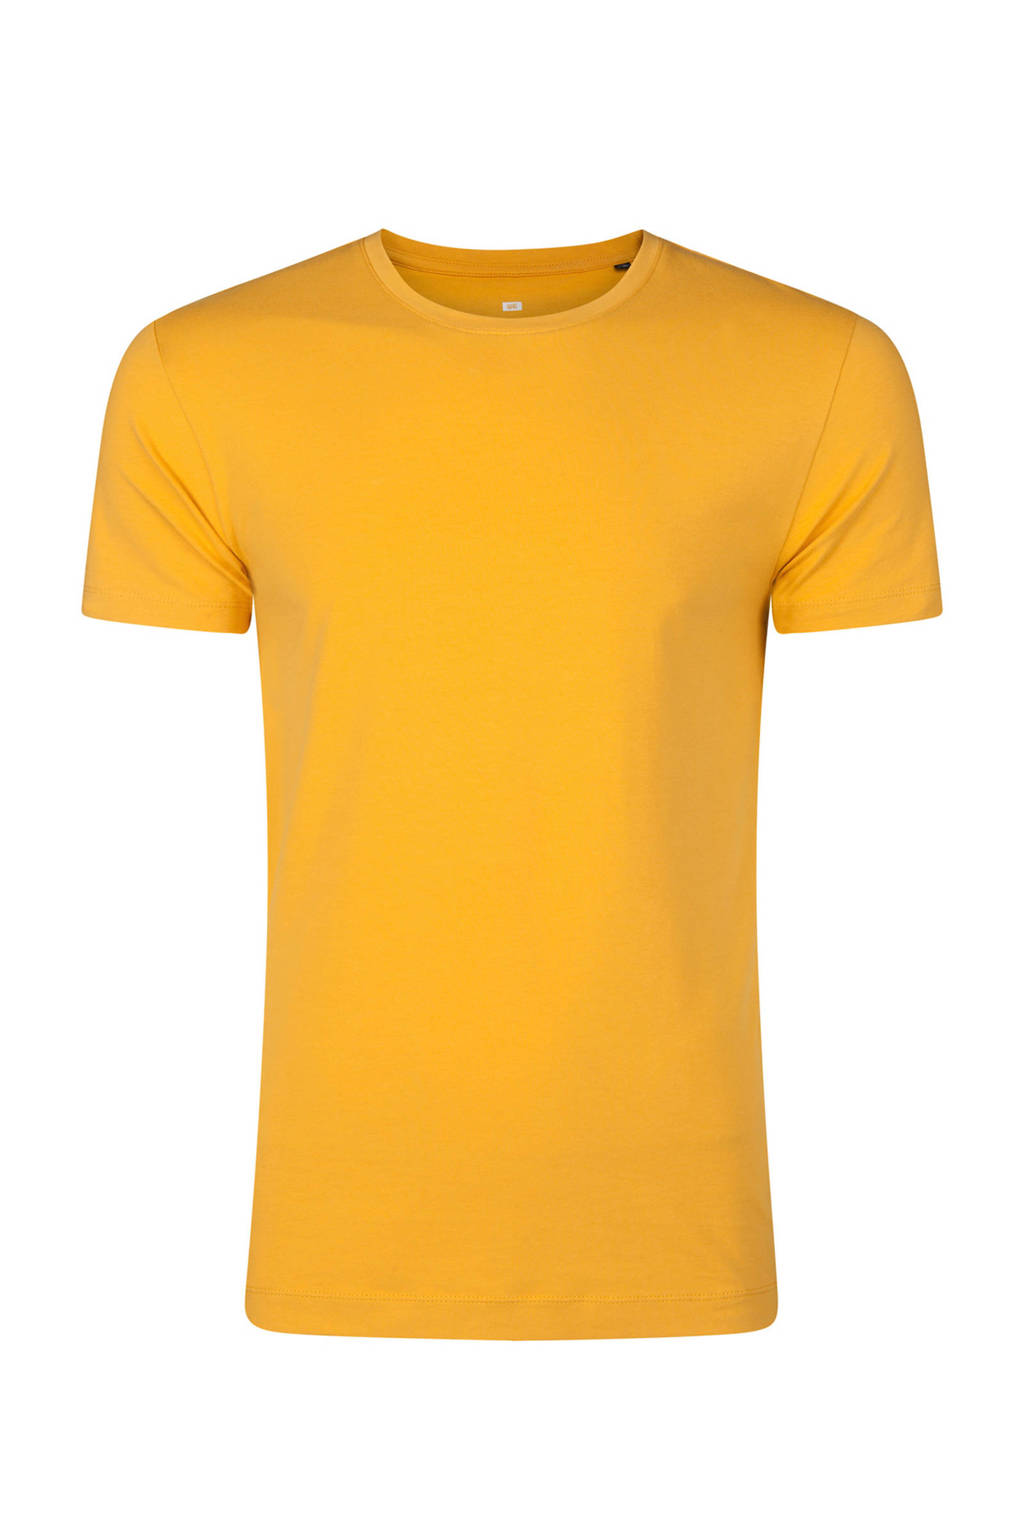 WE Fashion T-shirt, Geel